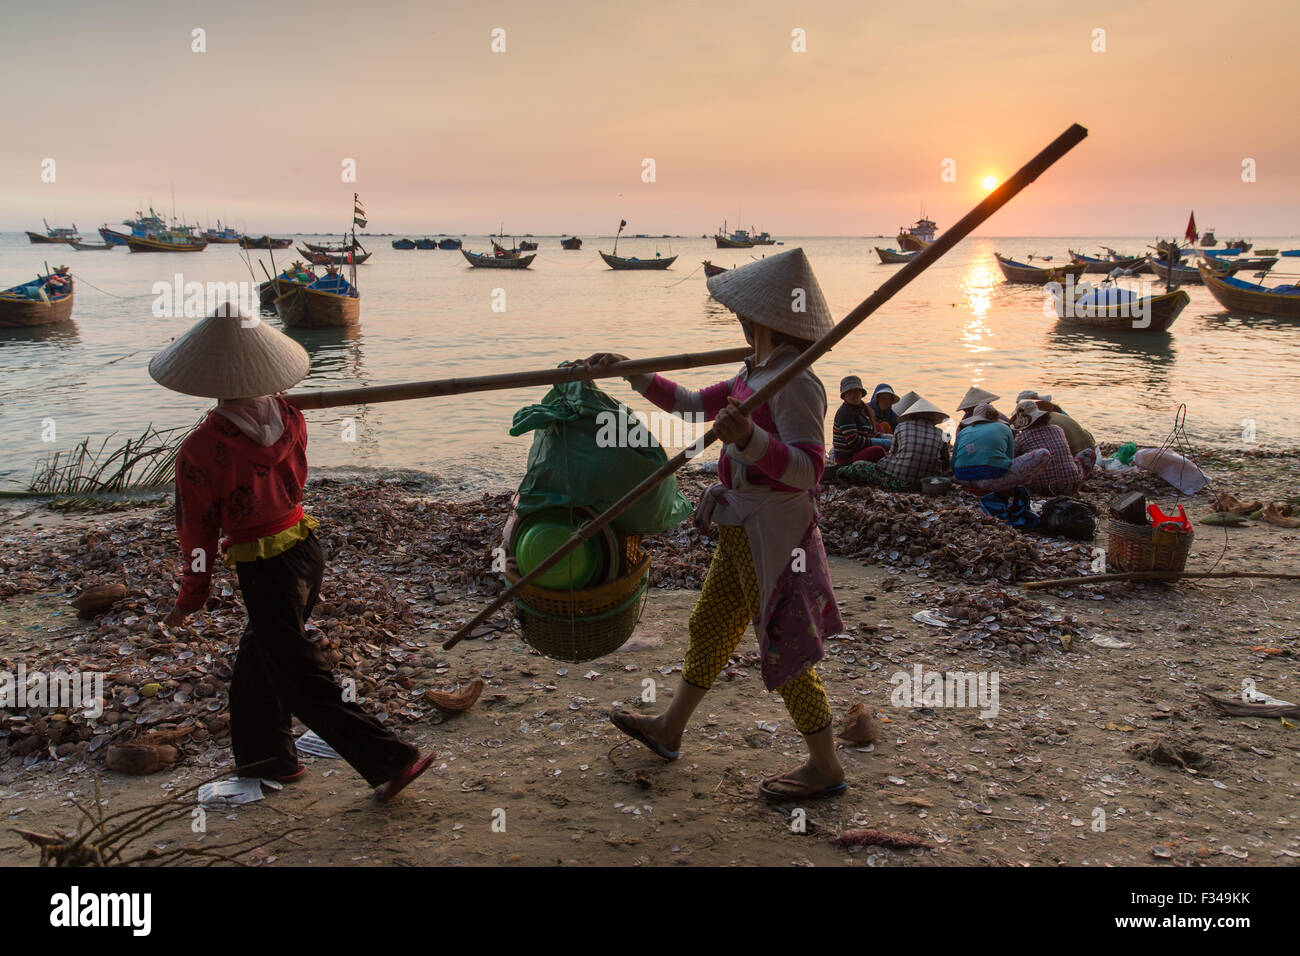 on the beach at Mũi Né fishing village at dusk, Bình Thuận Province, Vietnam - Stock Image